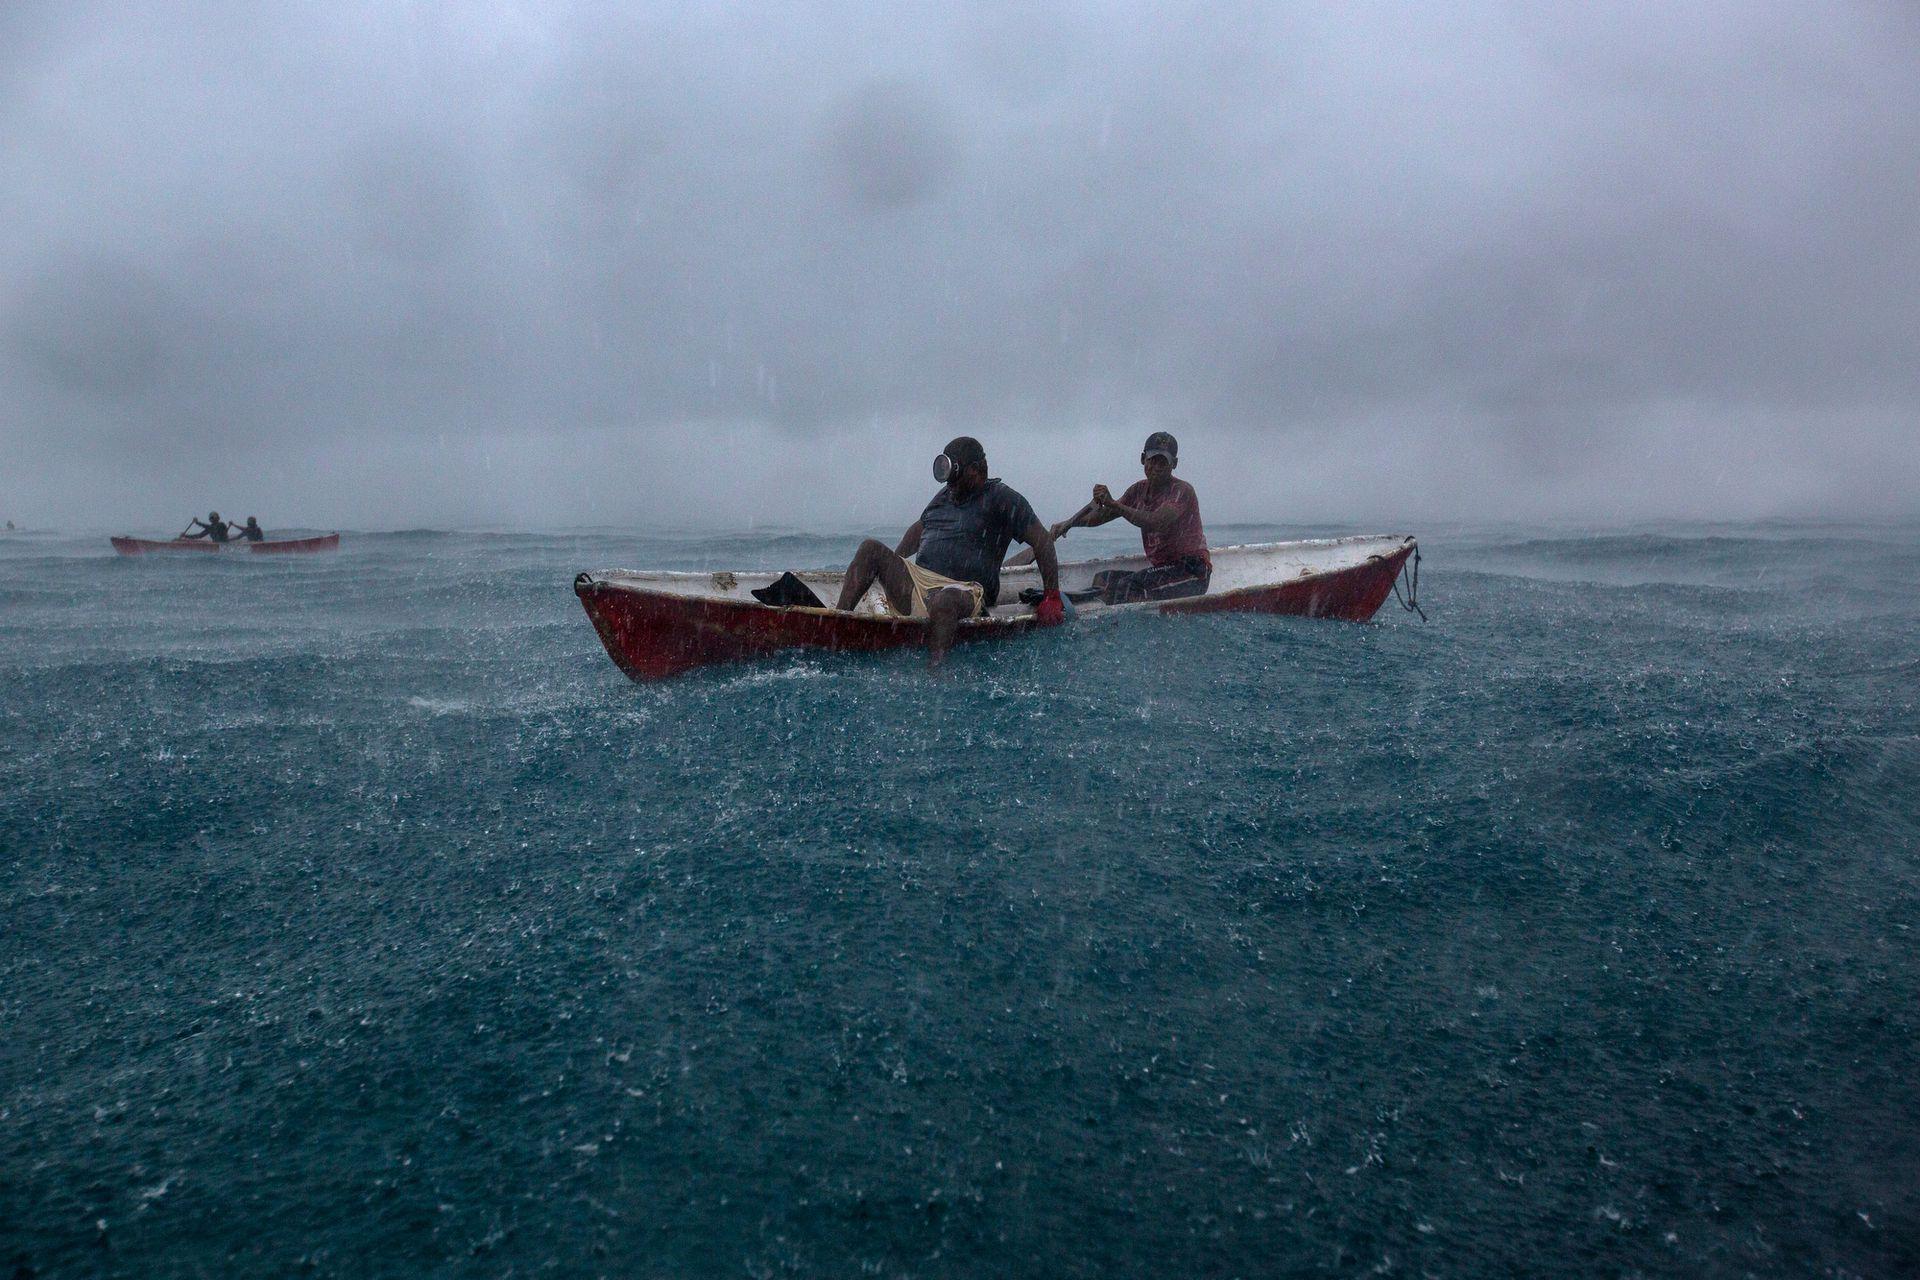 La pesca no se interrumpe pese a una fuerte tormenta